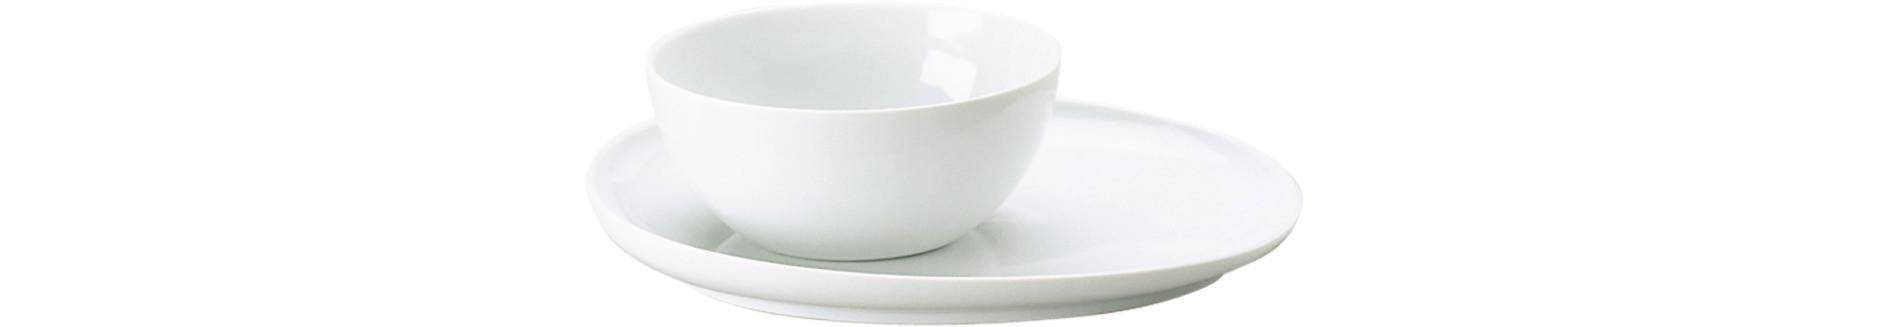 Five Senses, Suppen- / Soßenschale ø 130 mm / 0,45 l